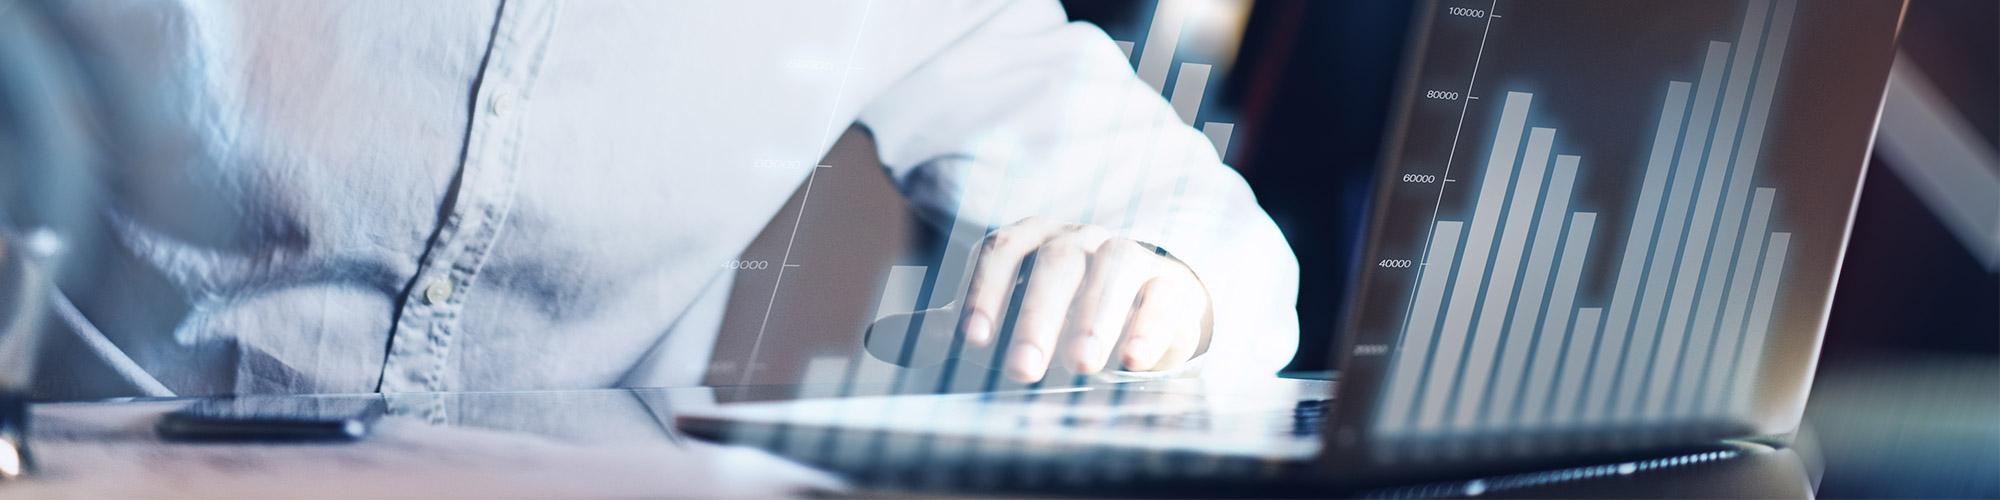 Software Asset Management for Office 365